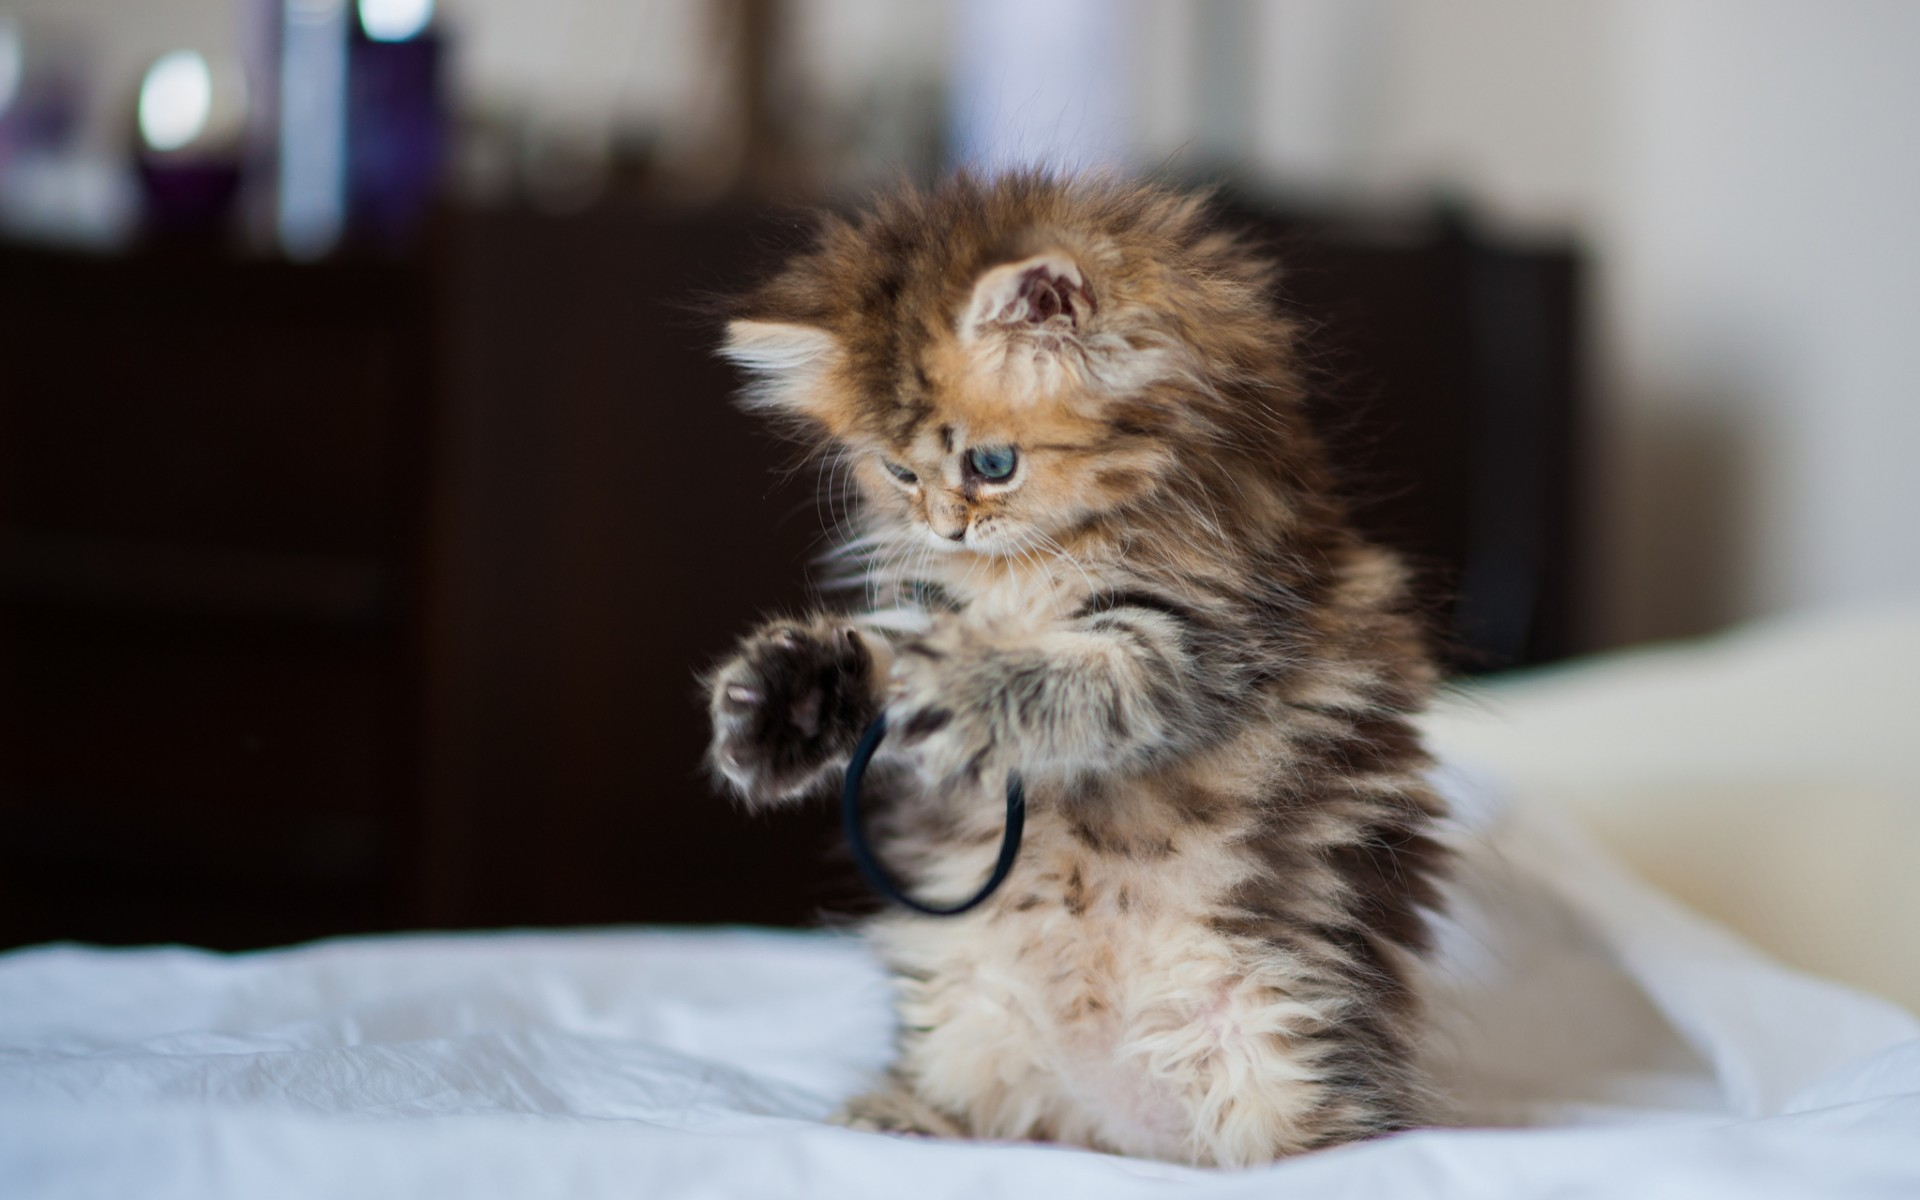 Animals cats felines kittiens babies cute wallpaper